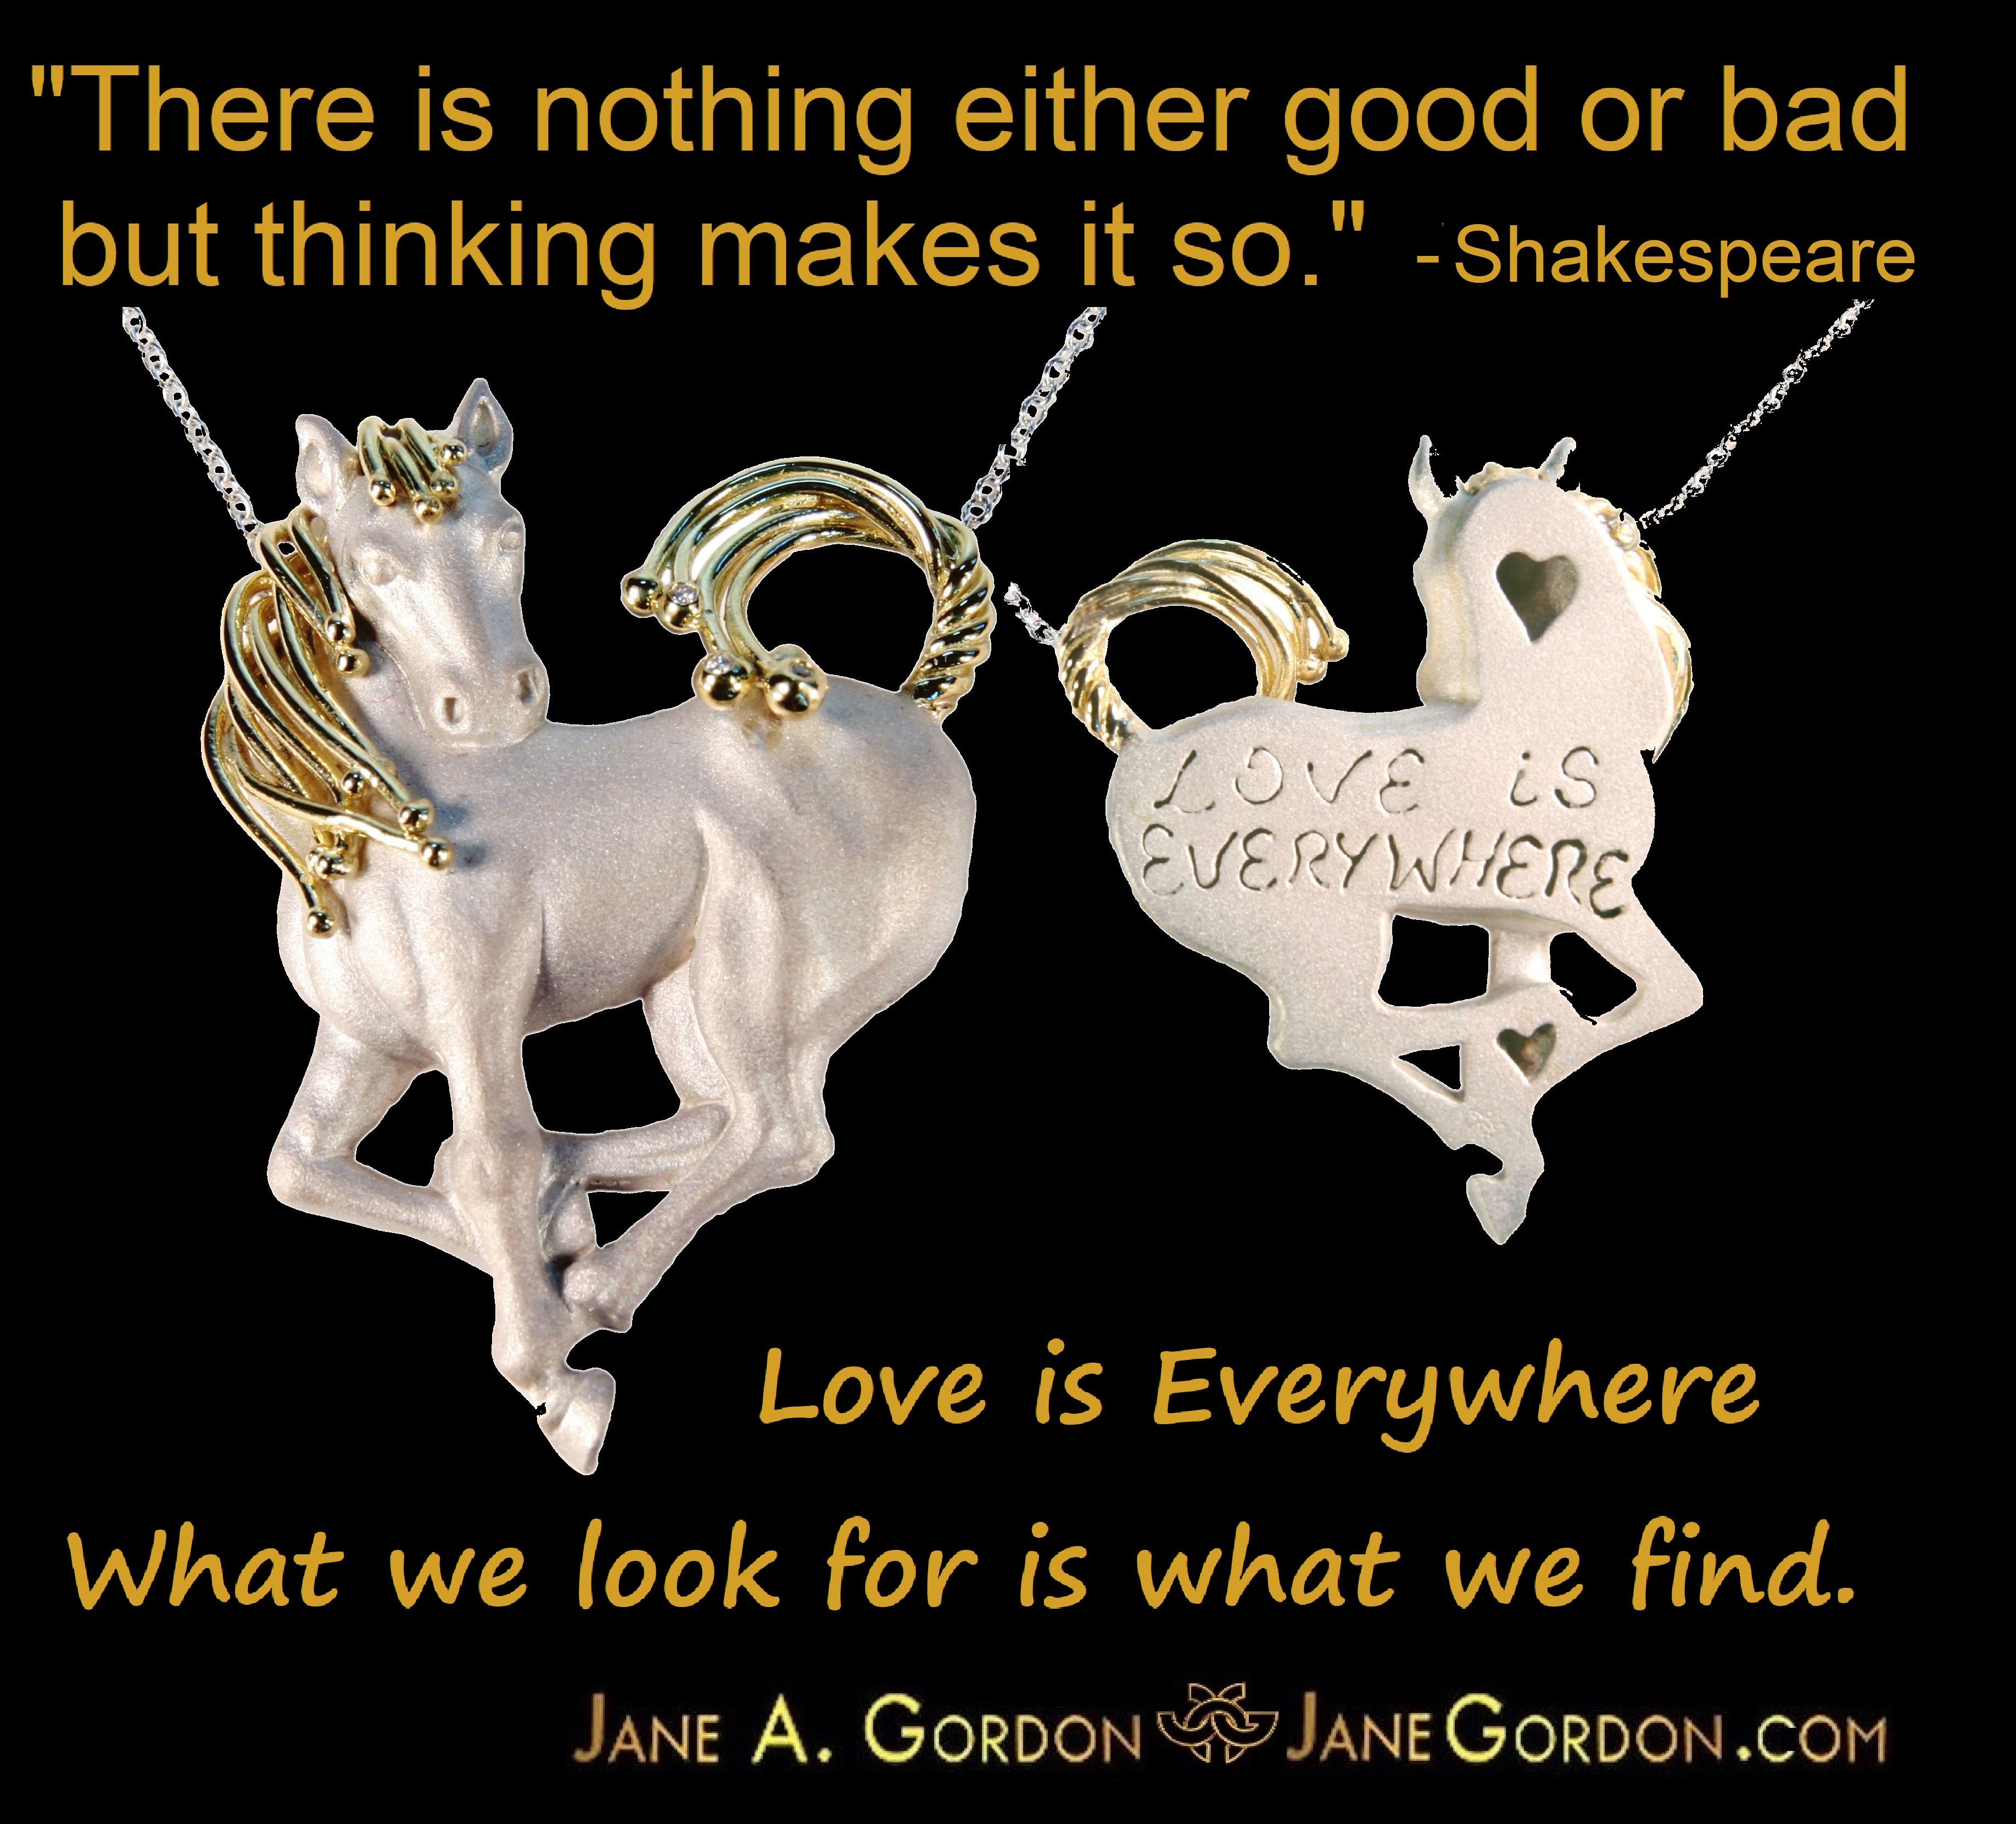 Equestrian Heart Horse: Love is Everywhere